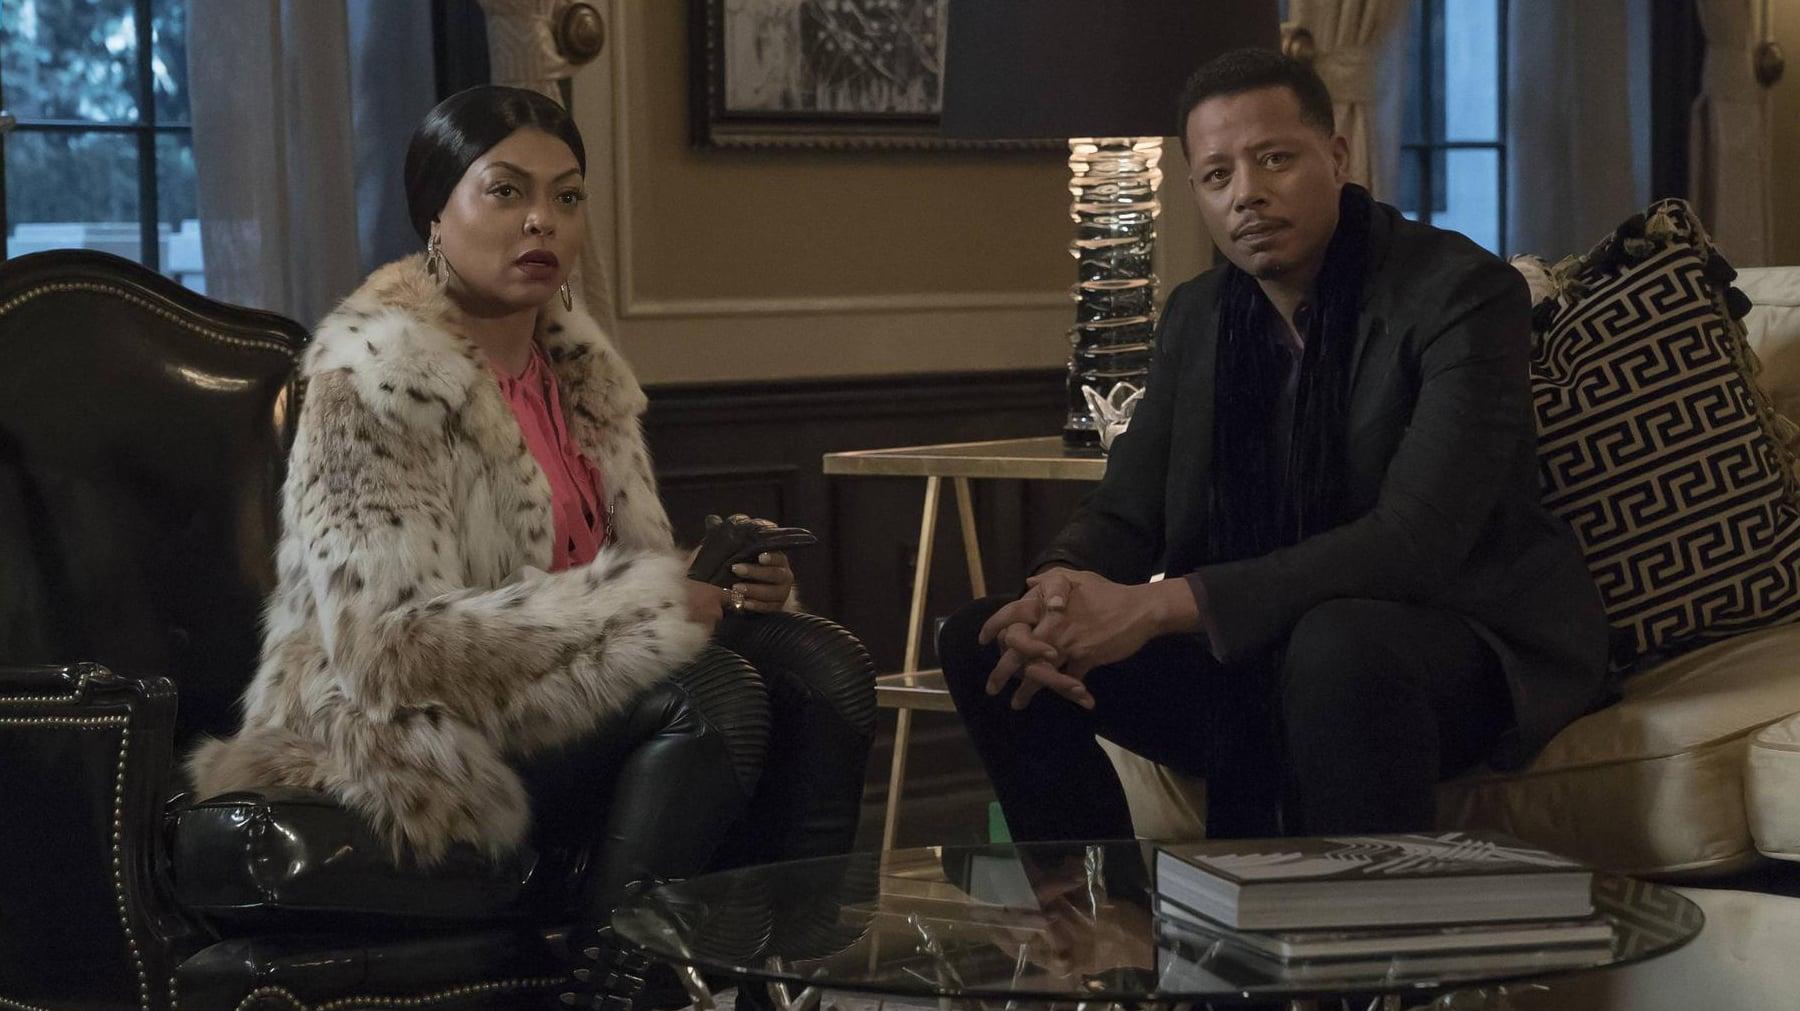 empire season 3 episode 16 openload watch online full episode free tv show. Black Bedroom Furniture Sets. Home Design Ideas